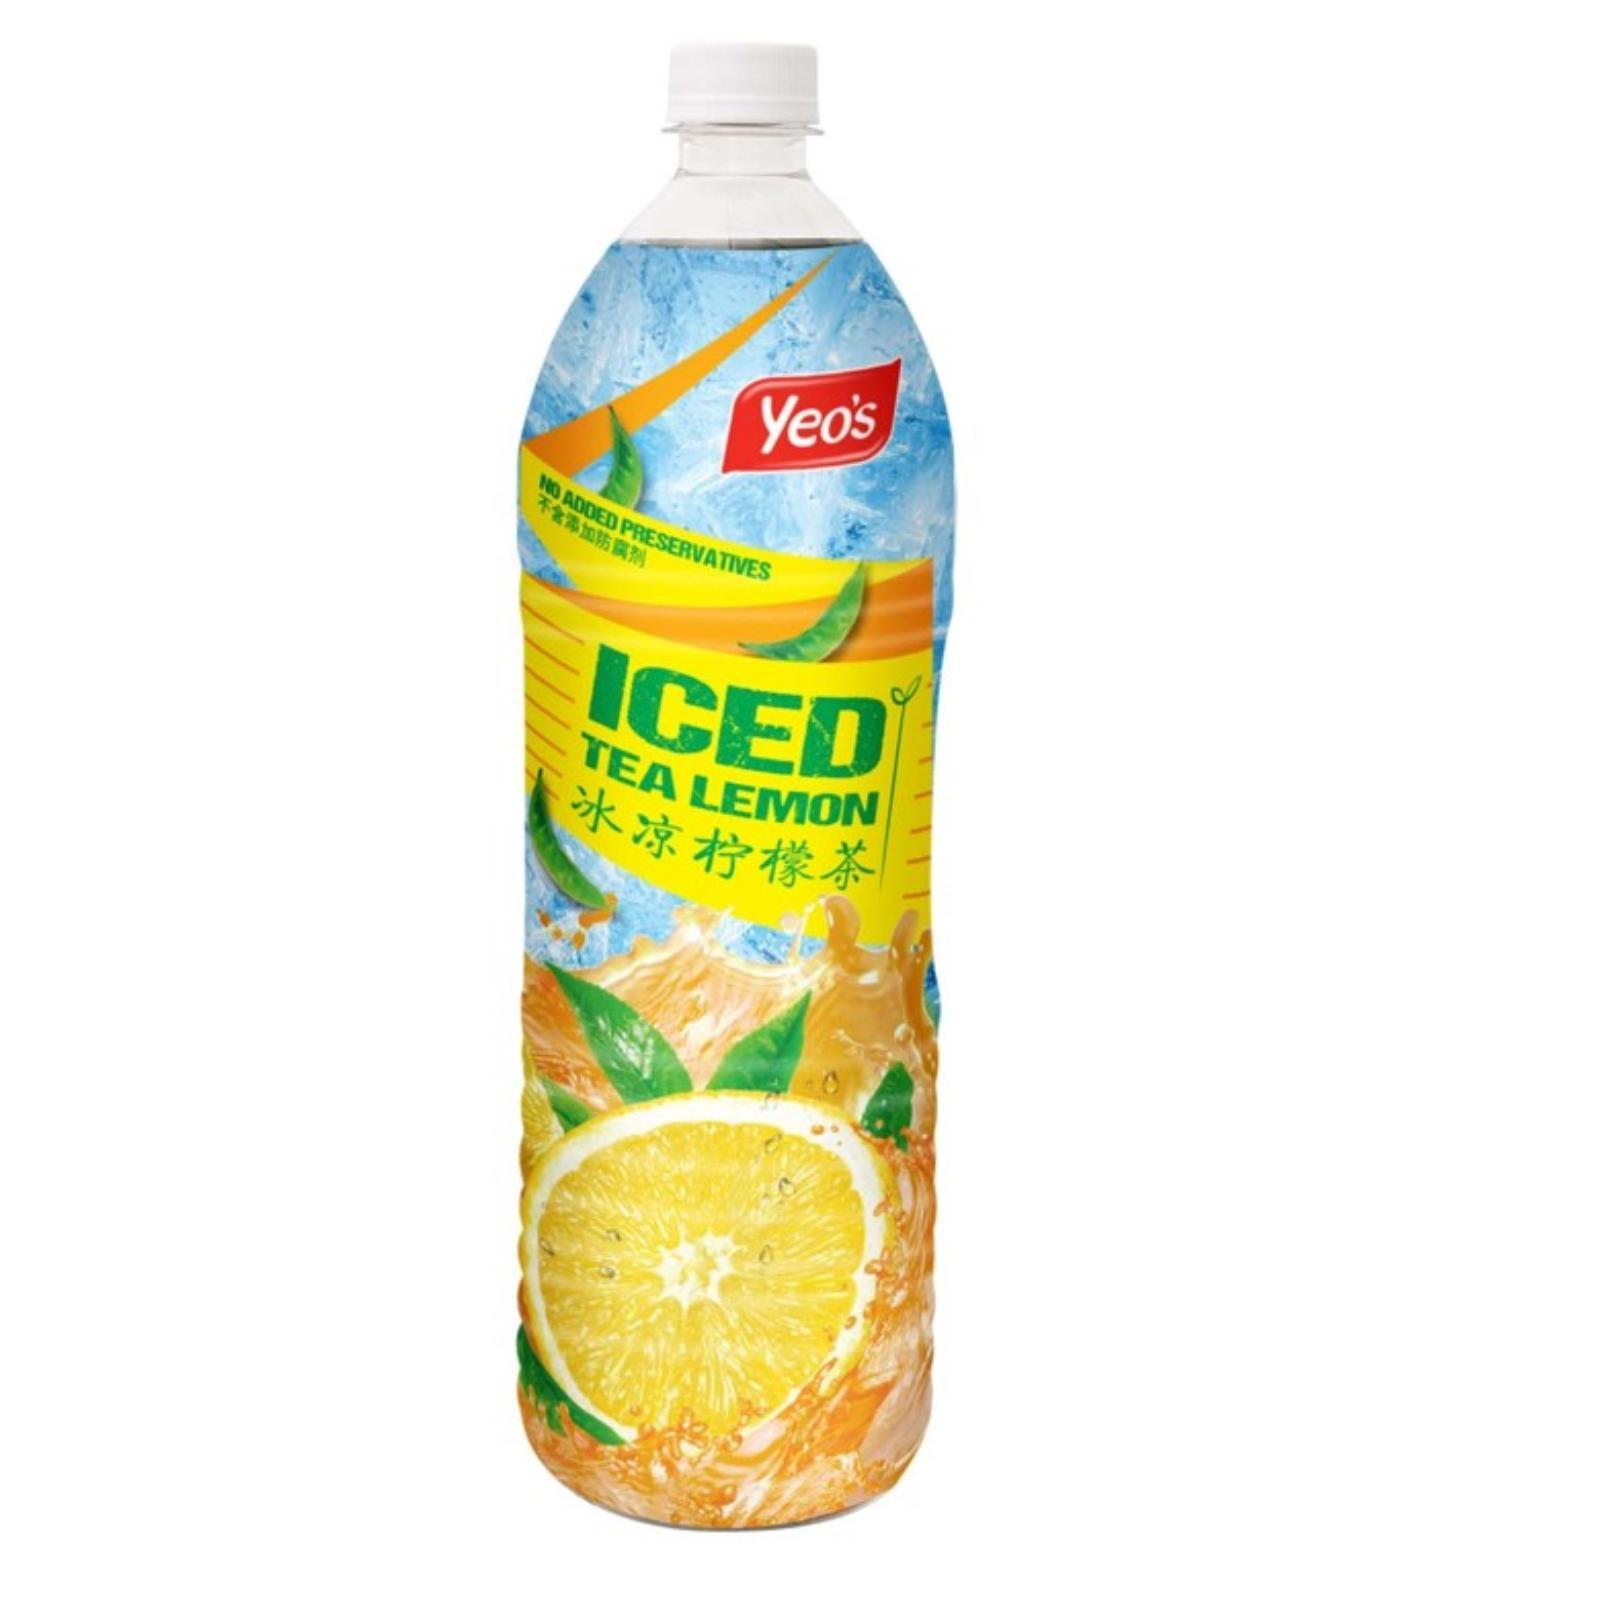 Yeo's Iced Lemon Tea